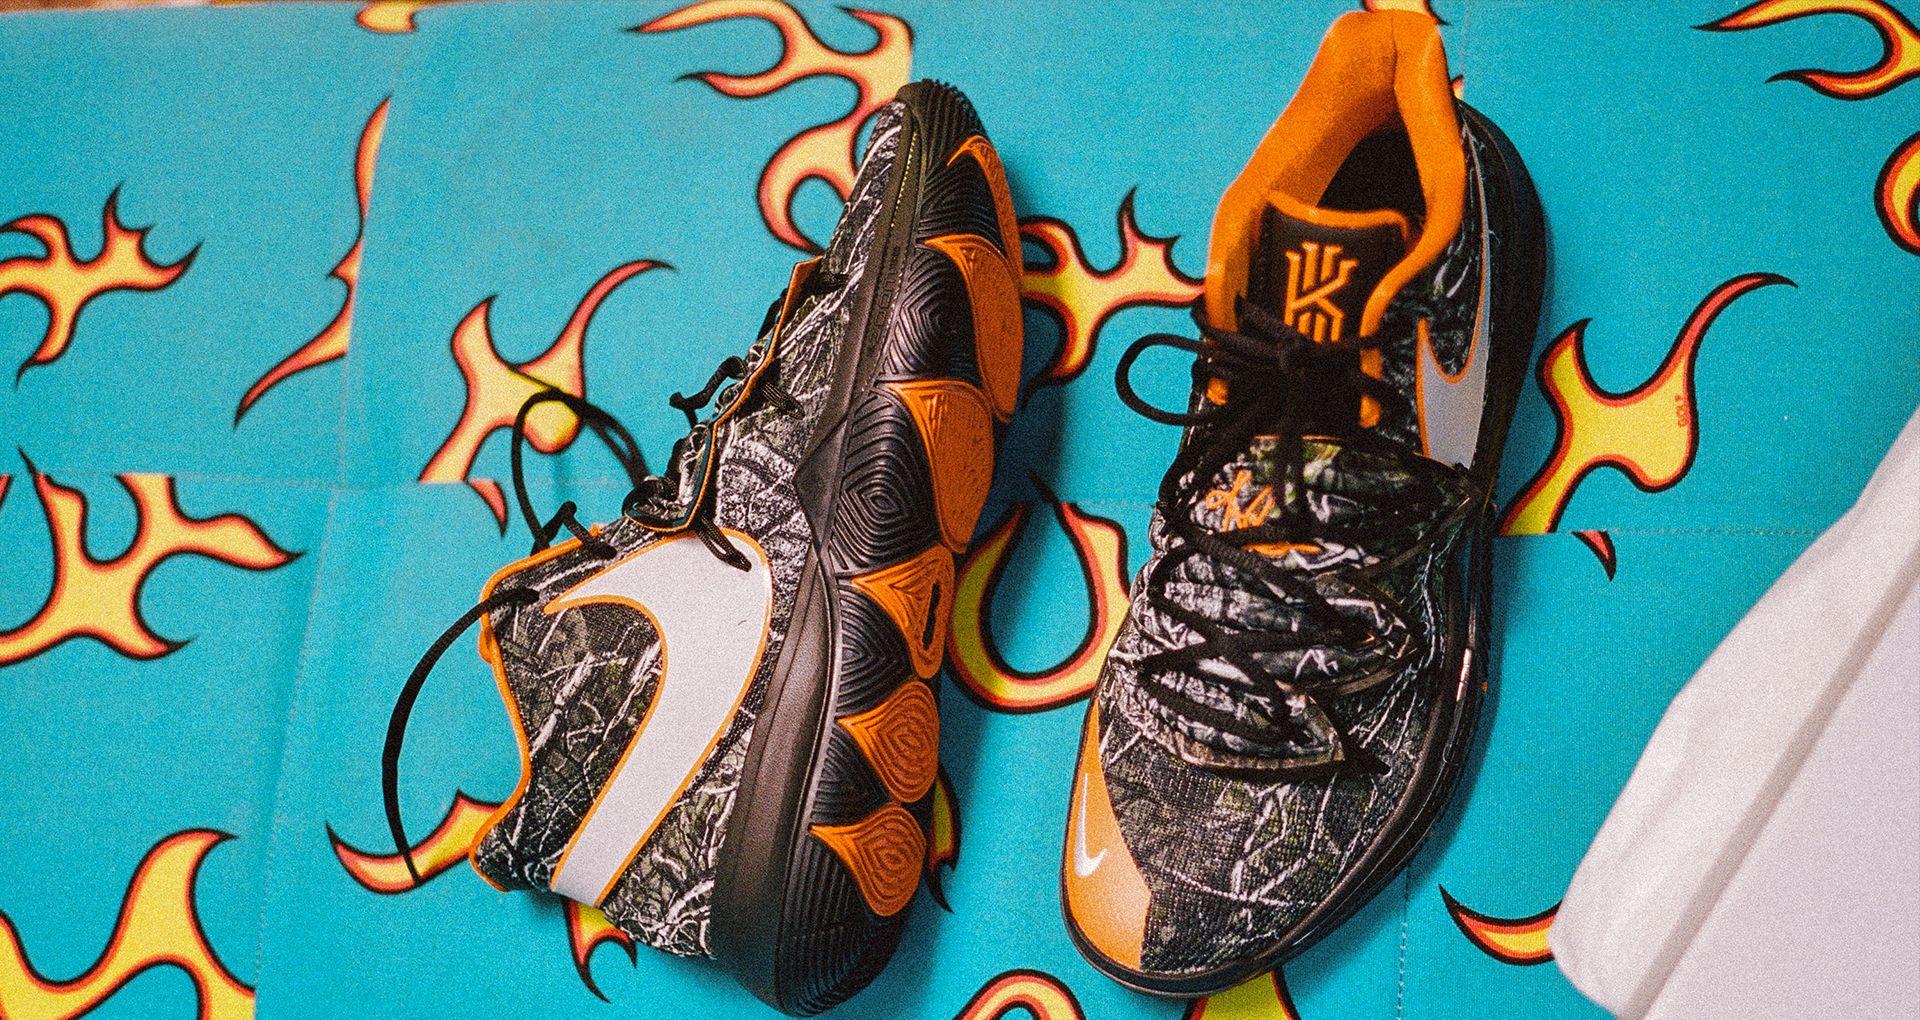 2a89559d640c44 Kyrie 5 x Taco PE  A Day in the Life of Taco . Nike+ SNKRS